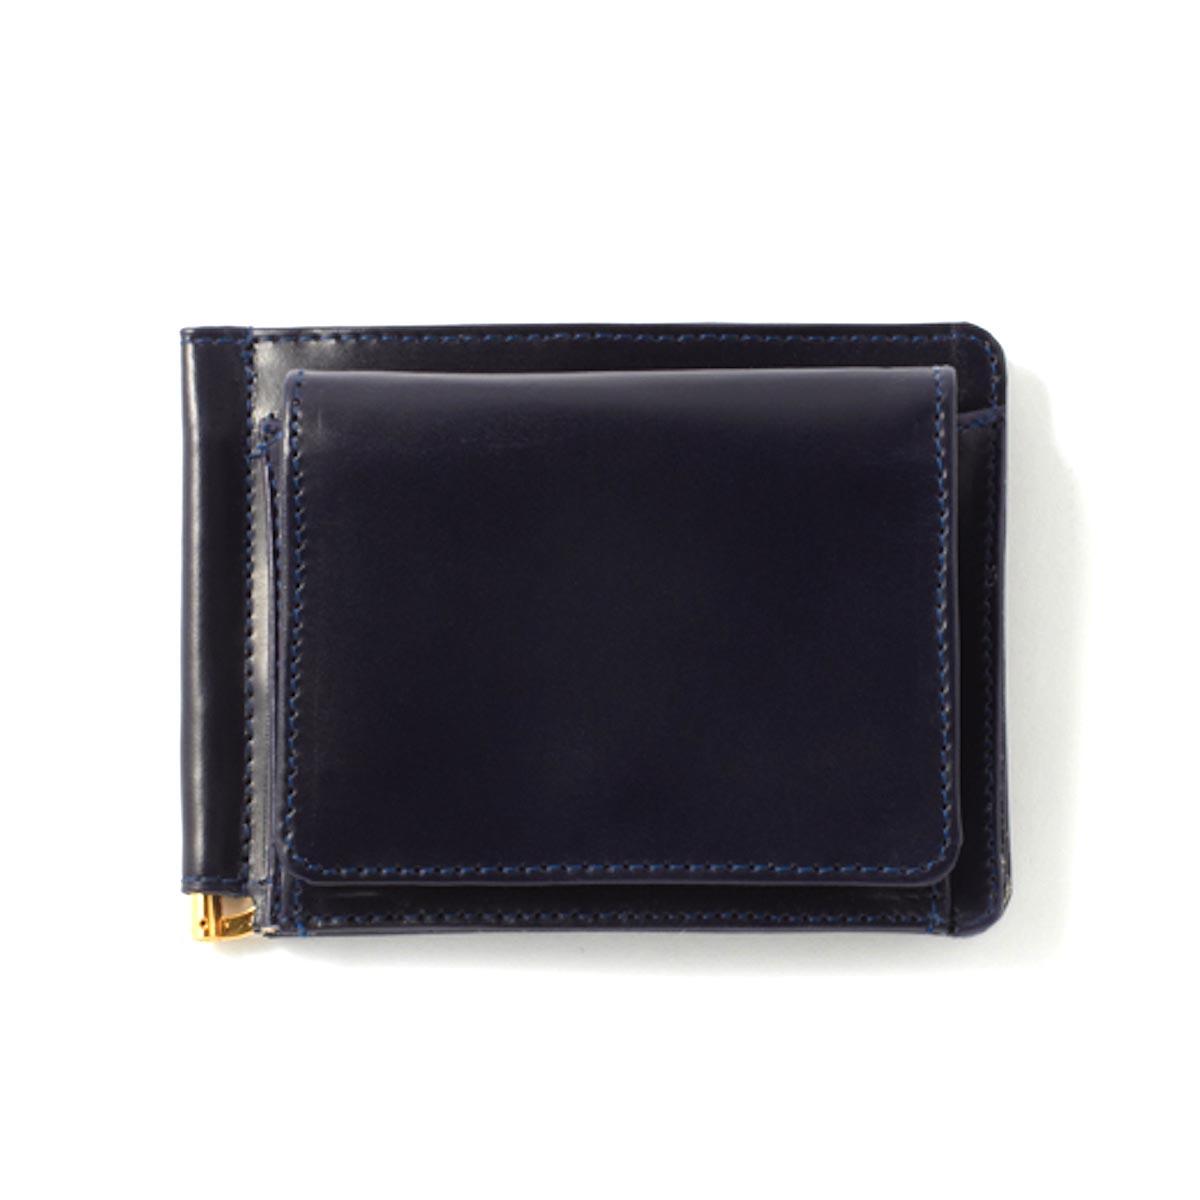 GLEN ROYAL / MONEY CLIP WITH COIN POCKET -DARK NAVY